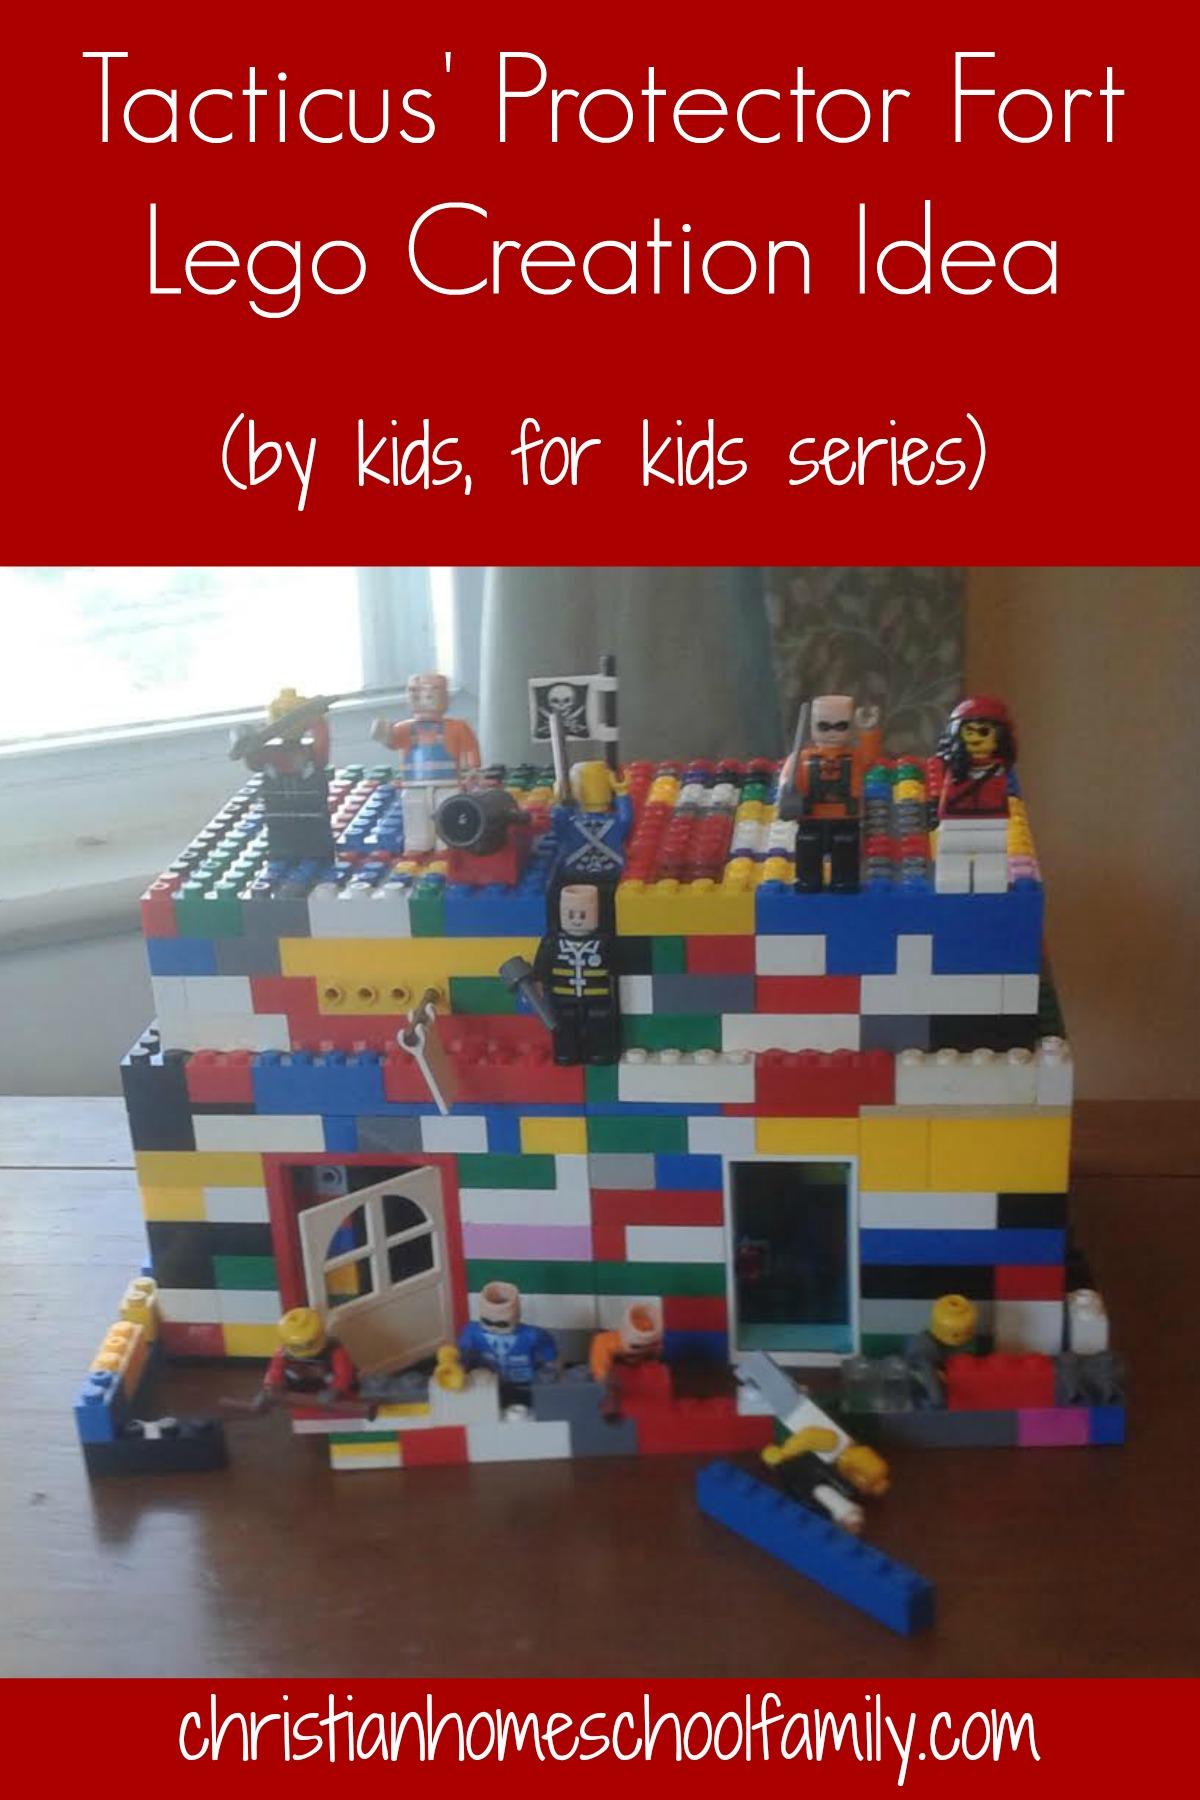 Lego fort creation idea | Christian Homeschool Family